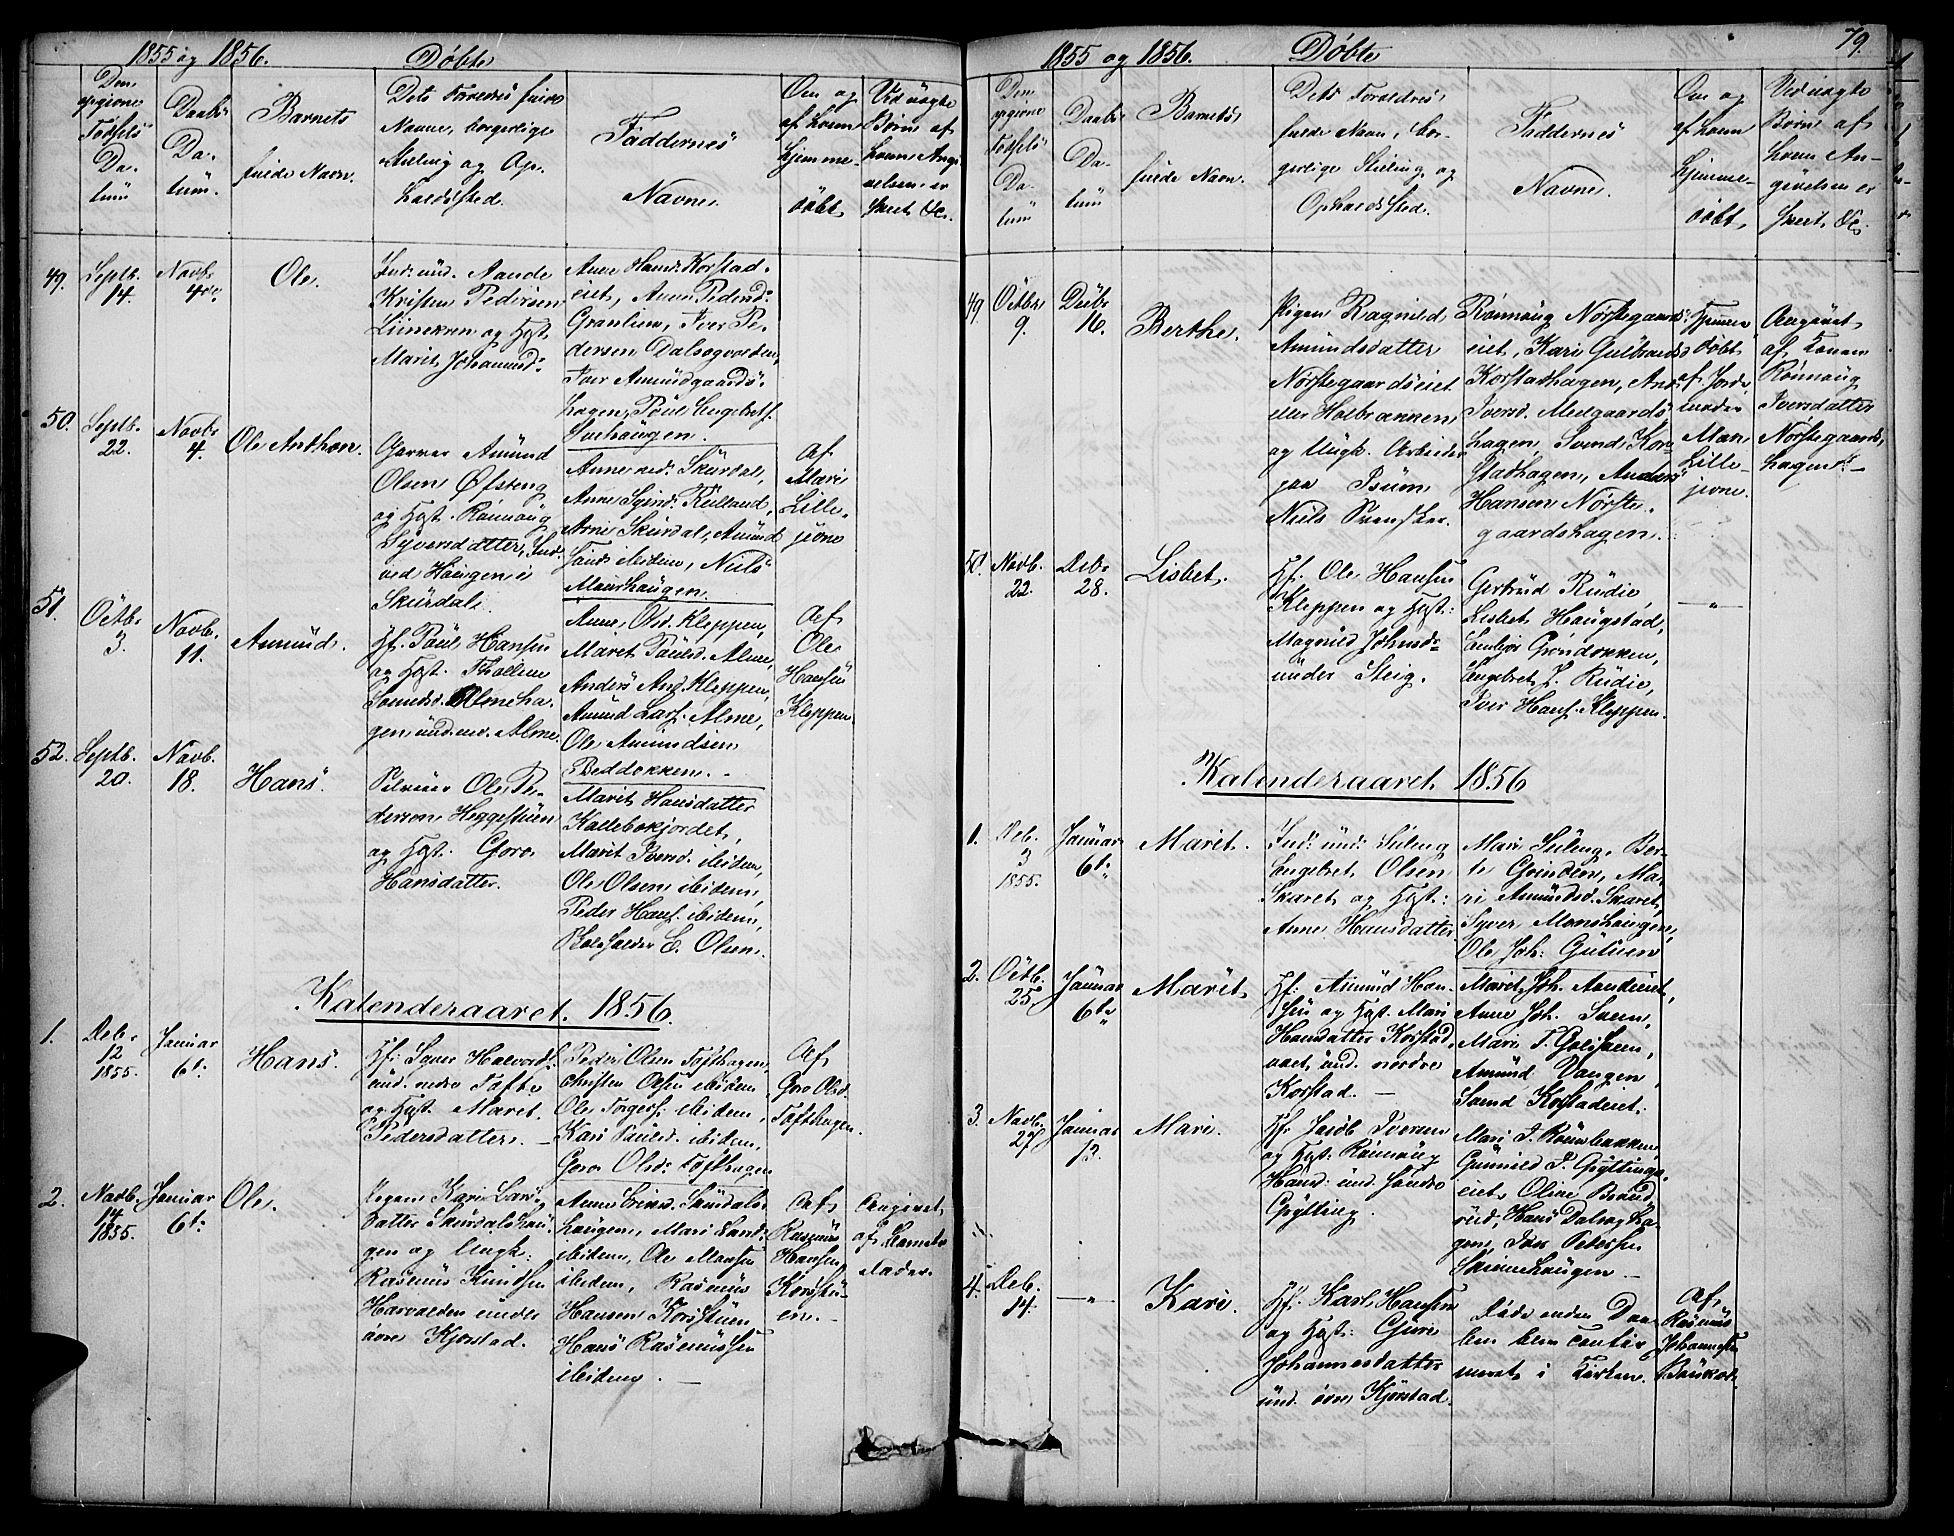 SAH, Sør-Fron prestekontor, H/Ha/Hab/L0001: Klokkerbok nr. 1, 1844-1863, s. 79